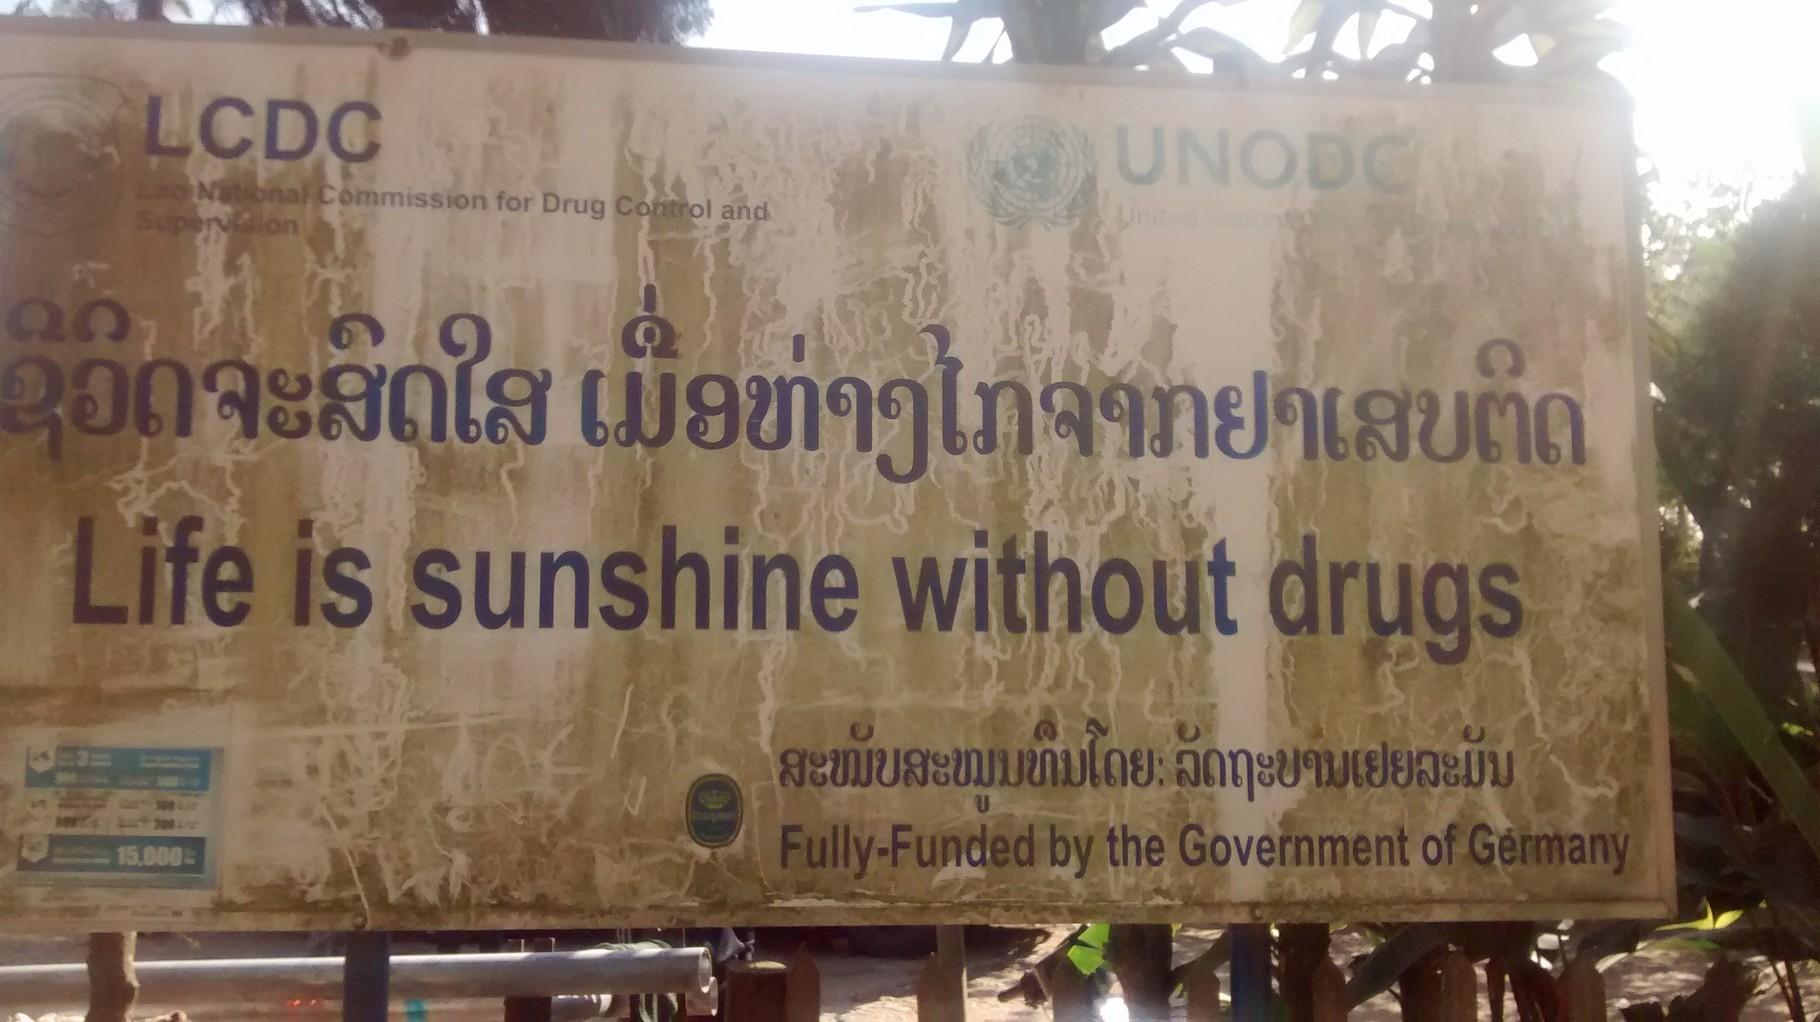 Die BRD unterstützt auch den Kampf gegen Drogen